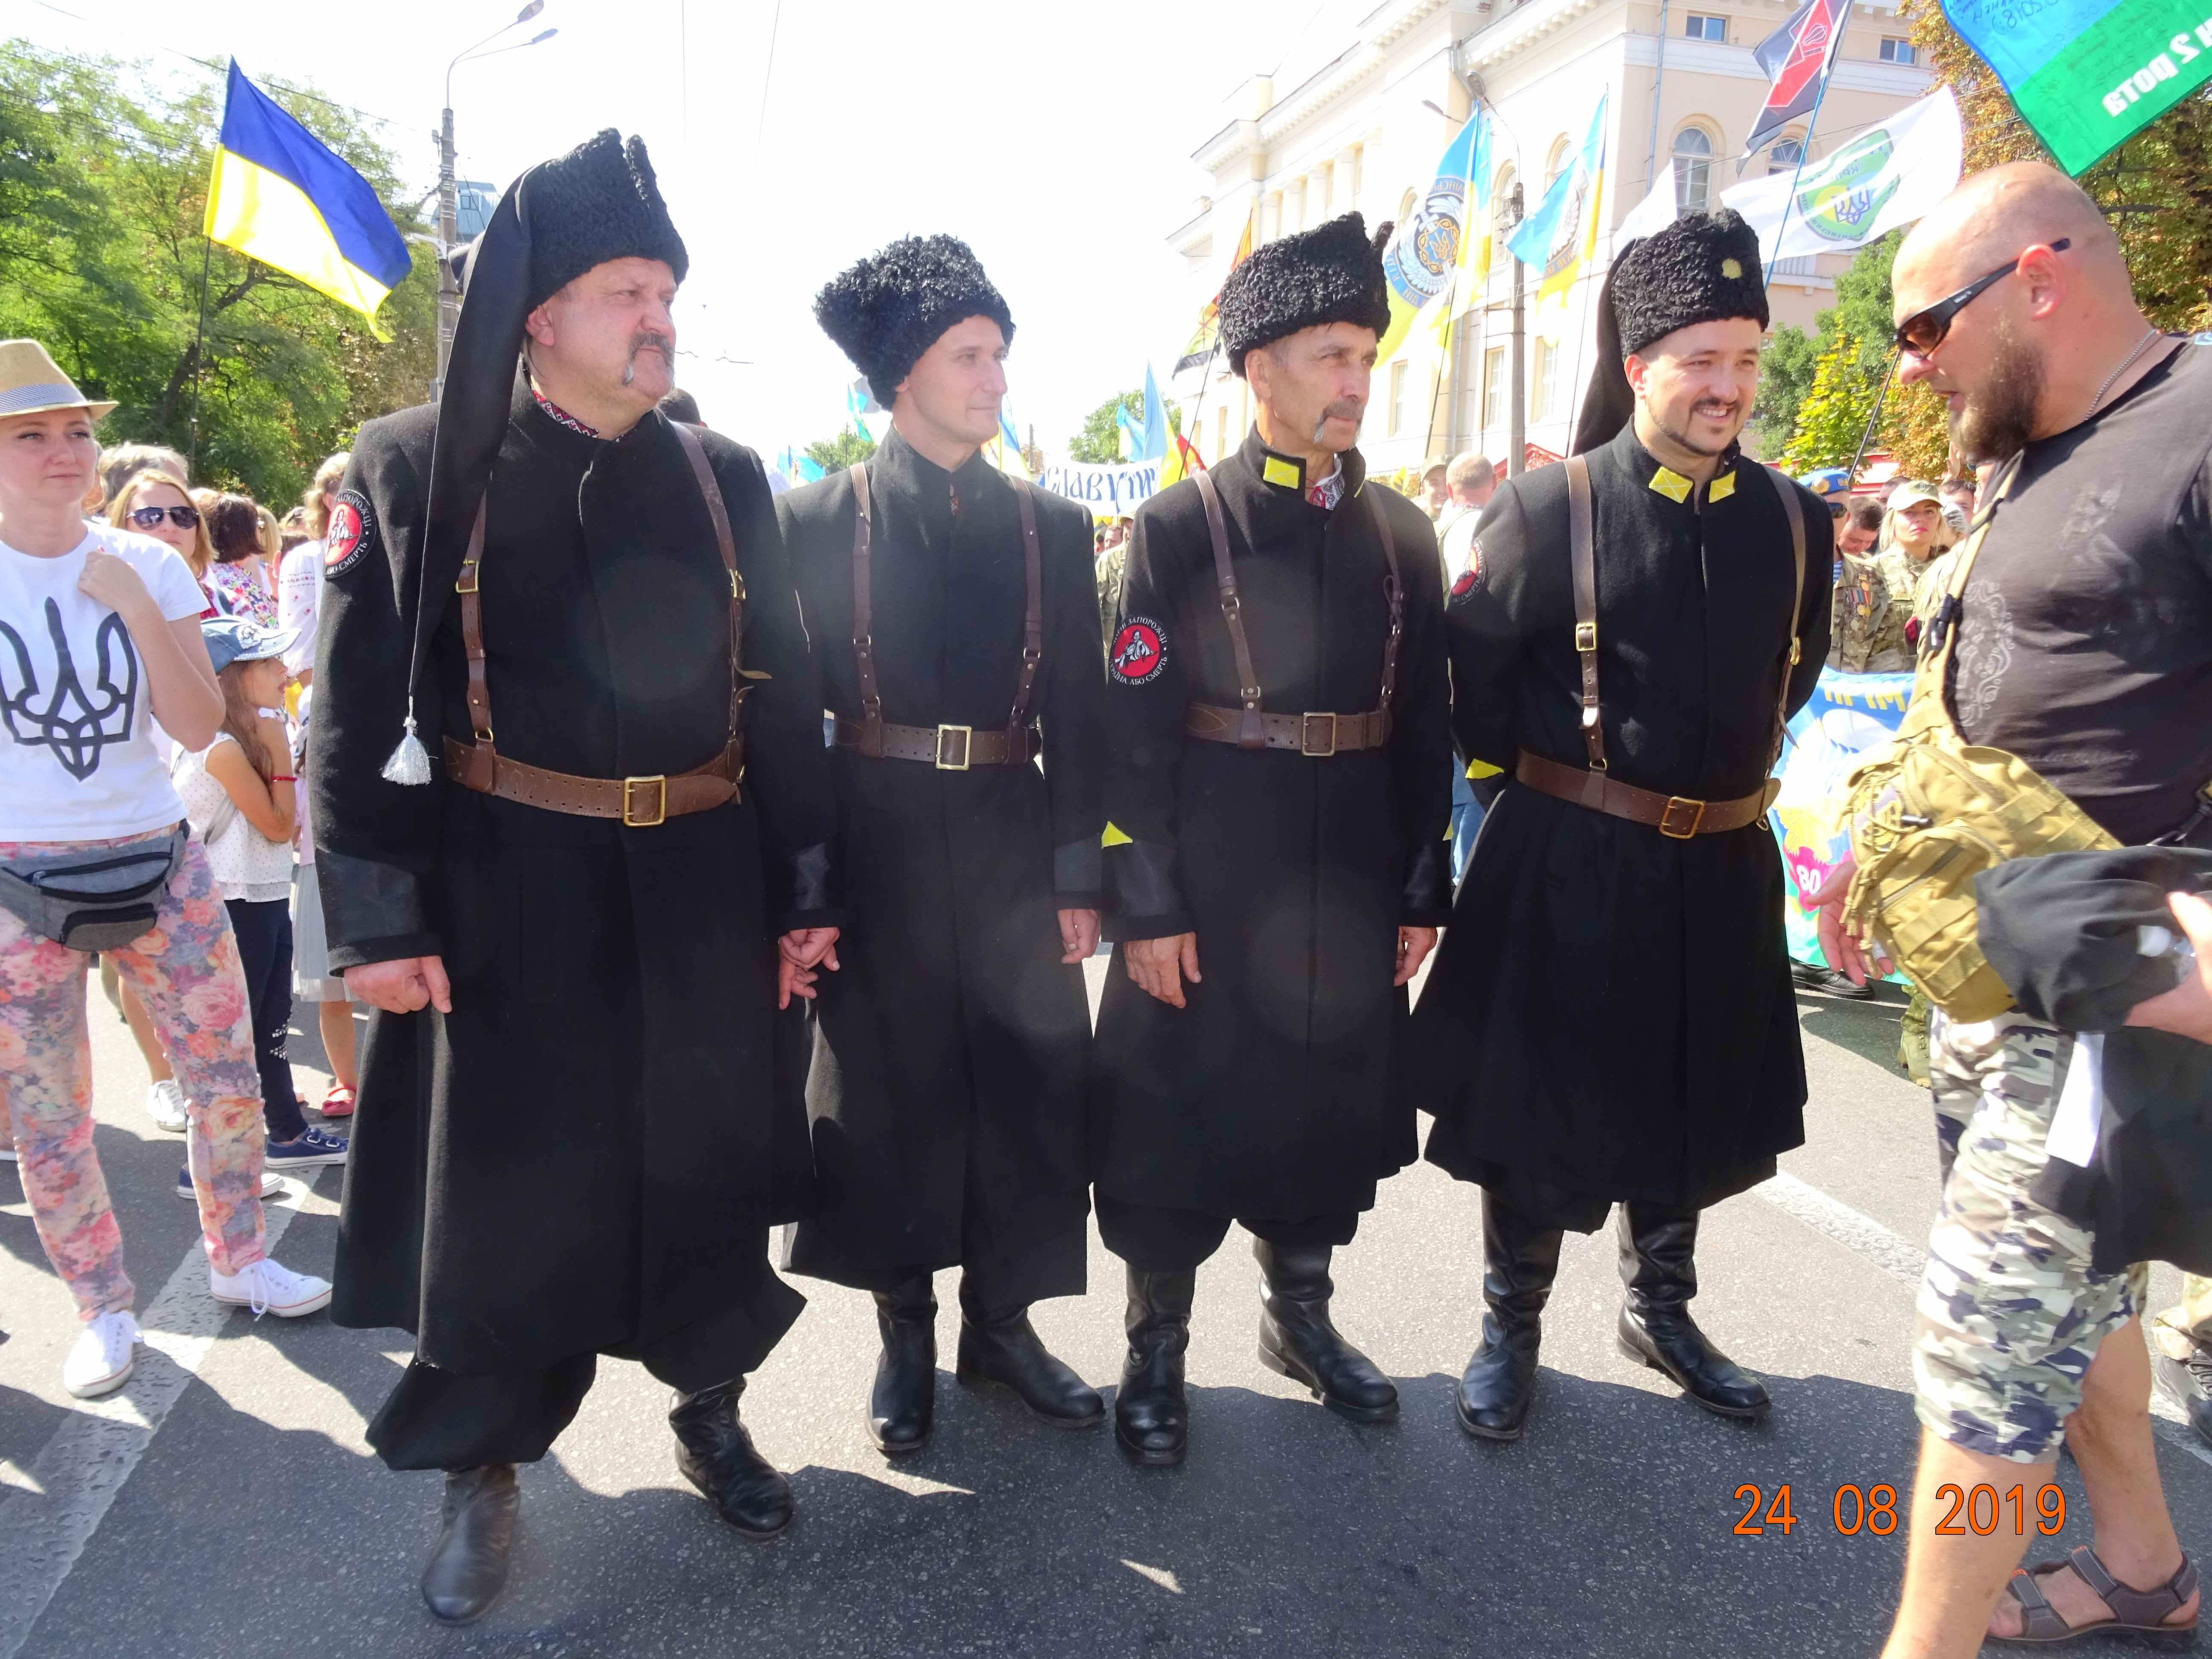 Defenders-of-Ukraine-Parad-24.Aug.19 - DSC06097.jpg